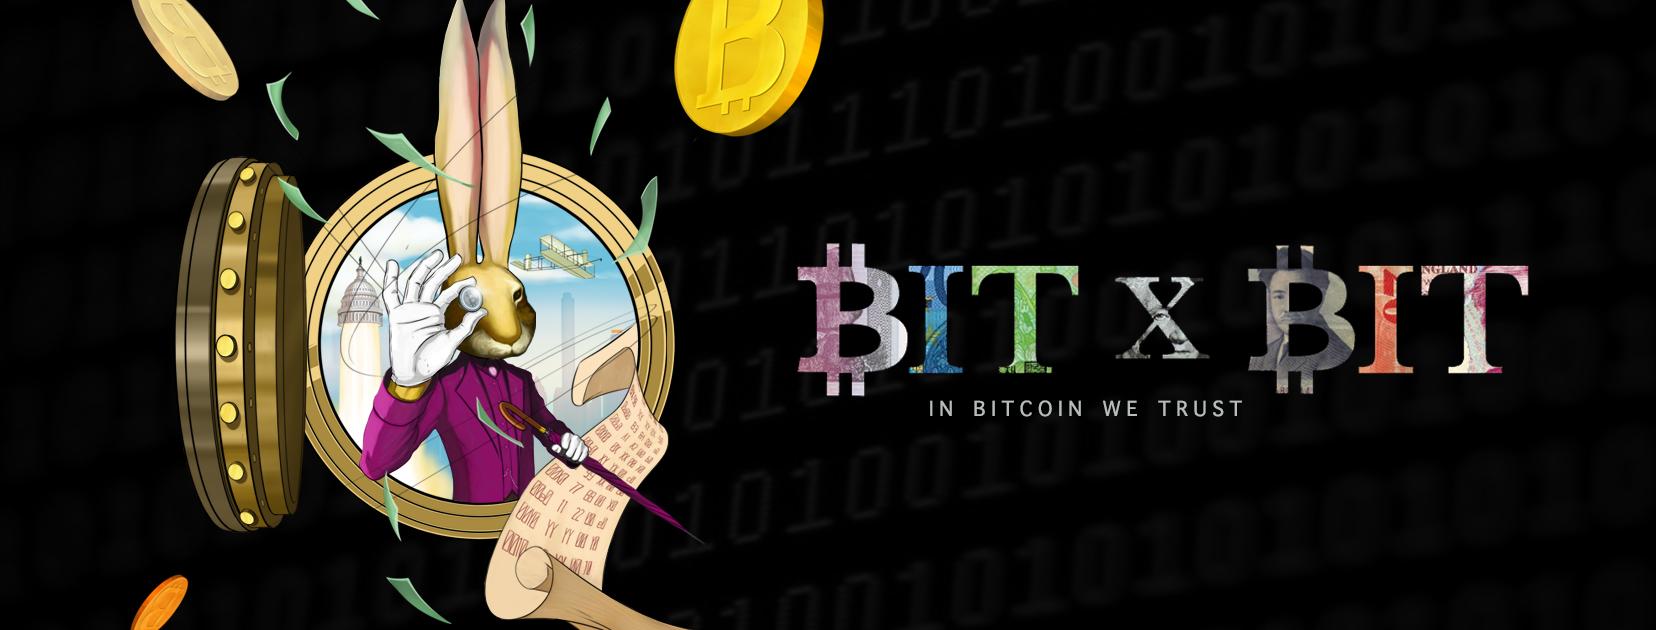 « In Bitcoin we trust » : documentaire sur la cryptomonnaie 0001